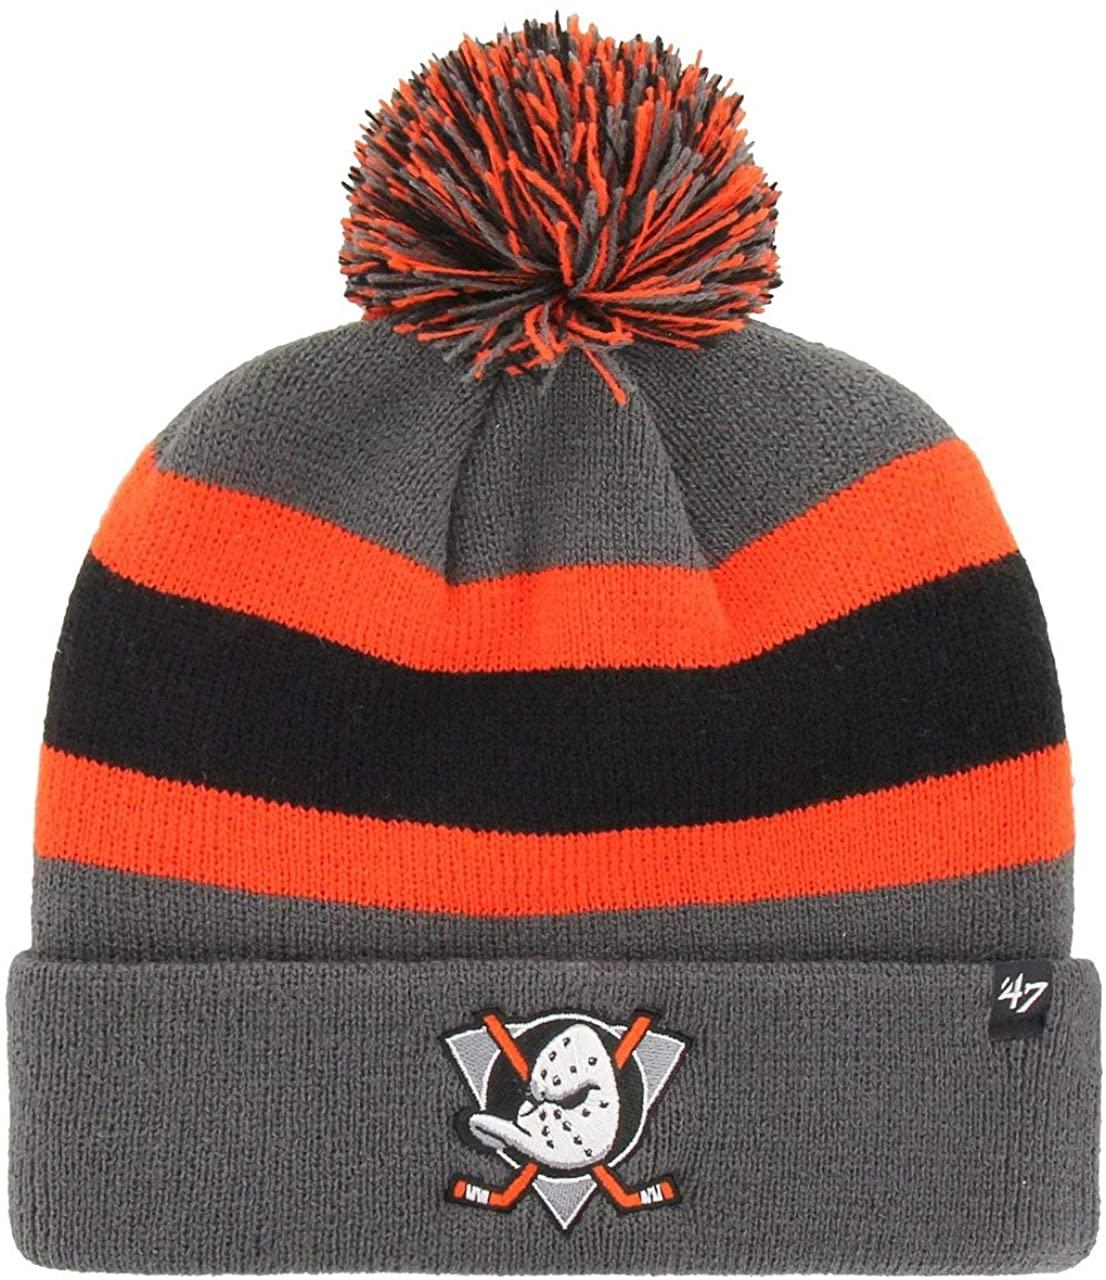 '47 Brand Anaheim Ducks NHL Charcoal Breakaway Cuff Knit Beany Hat One Size Mütze Forty Seven